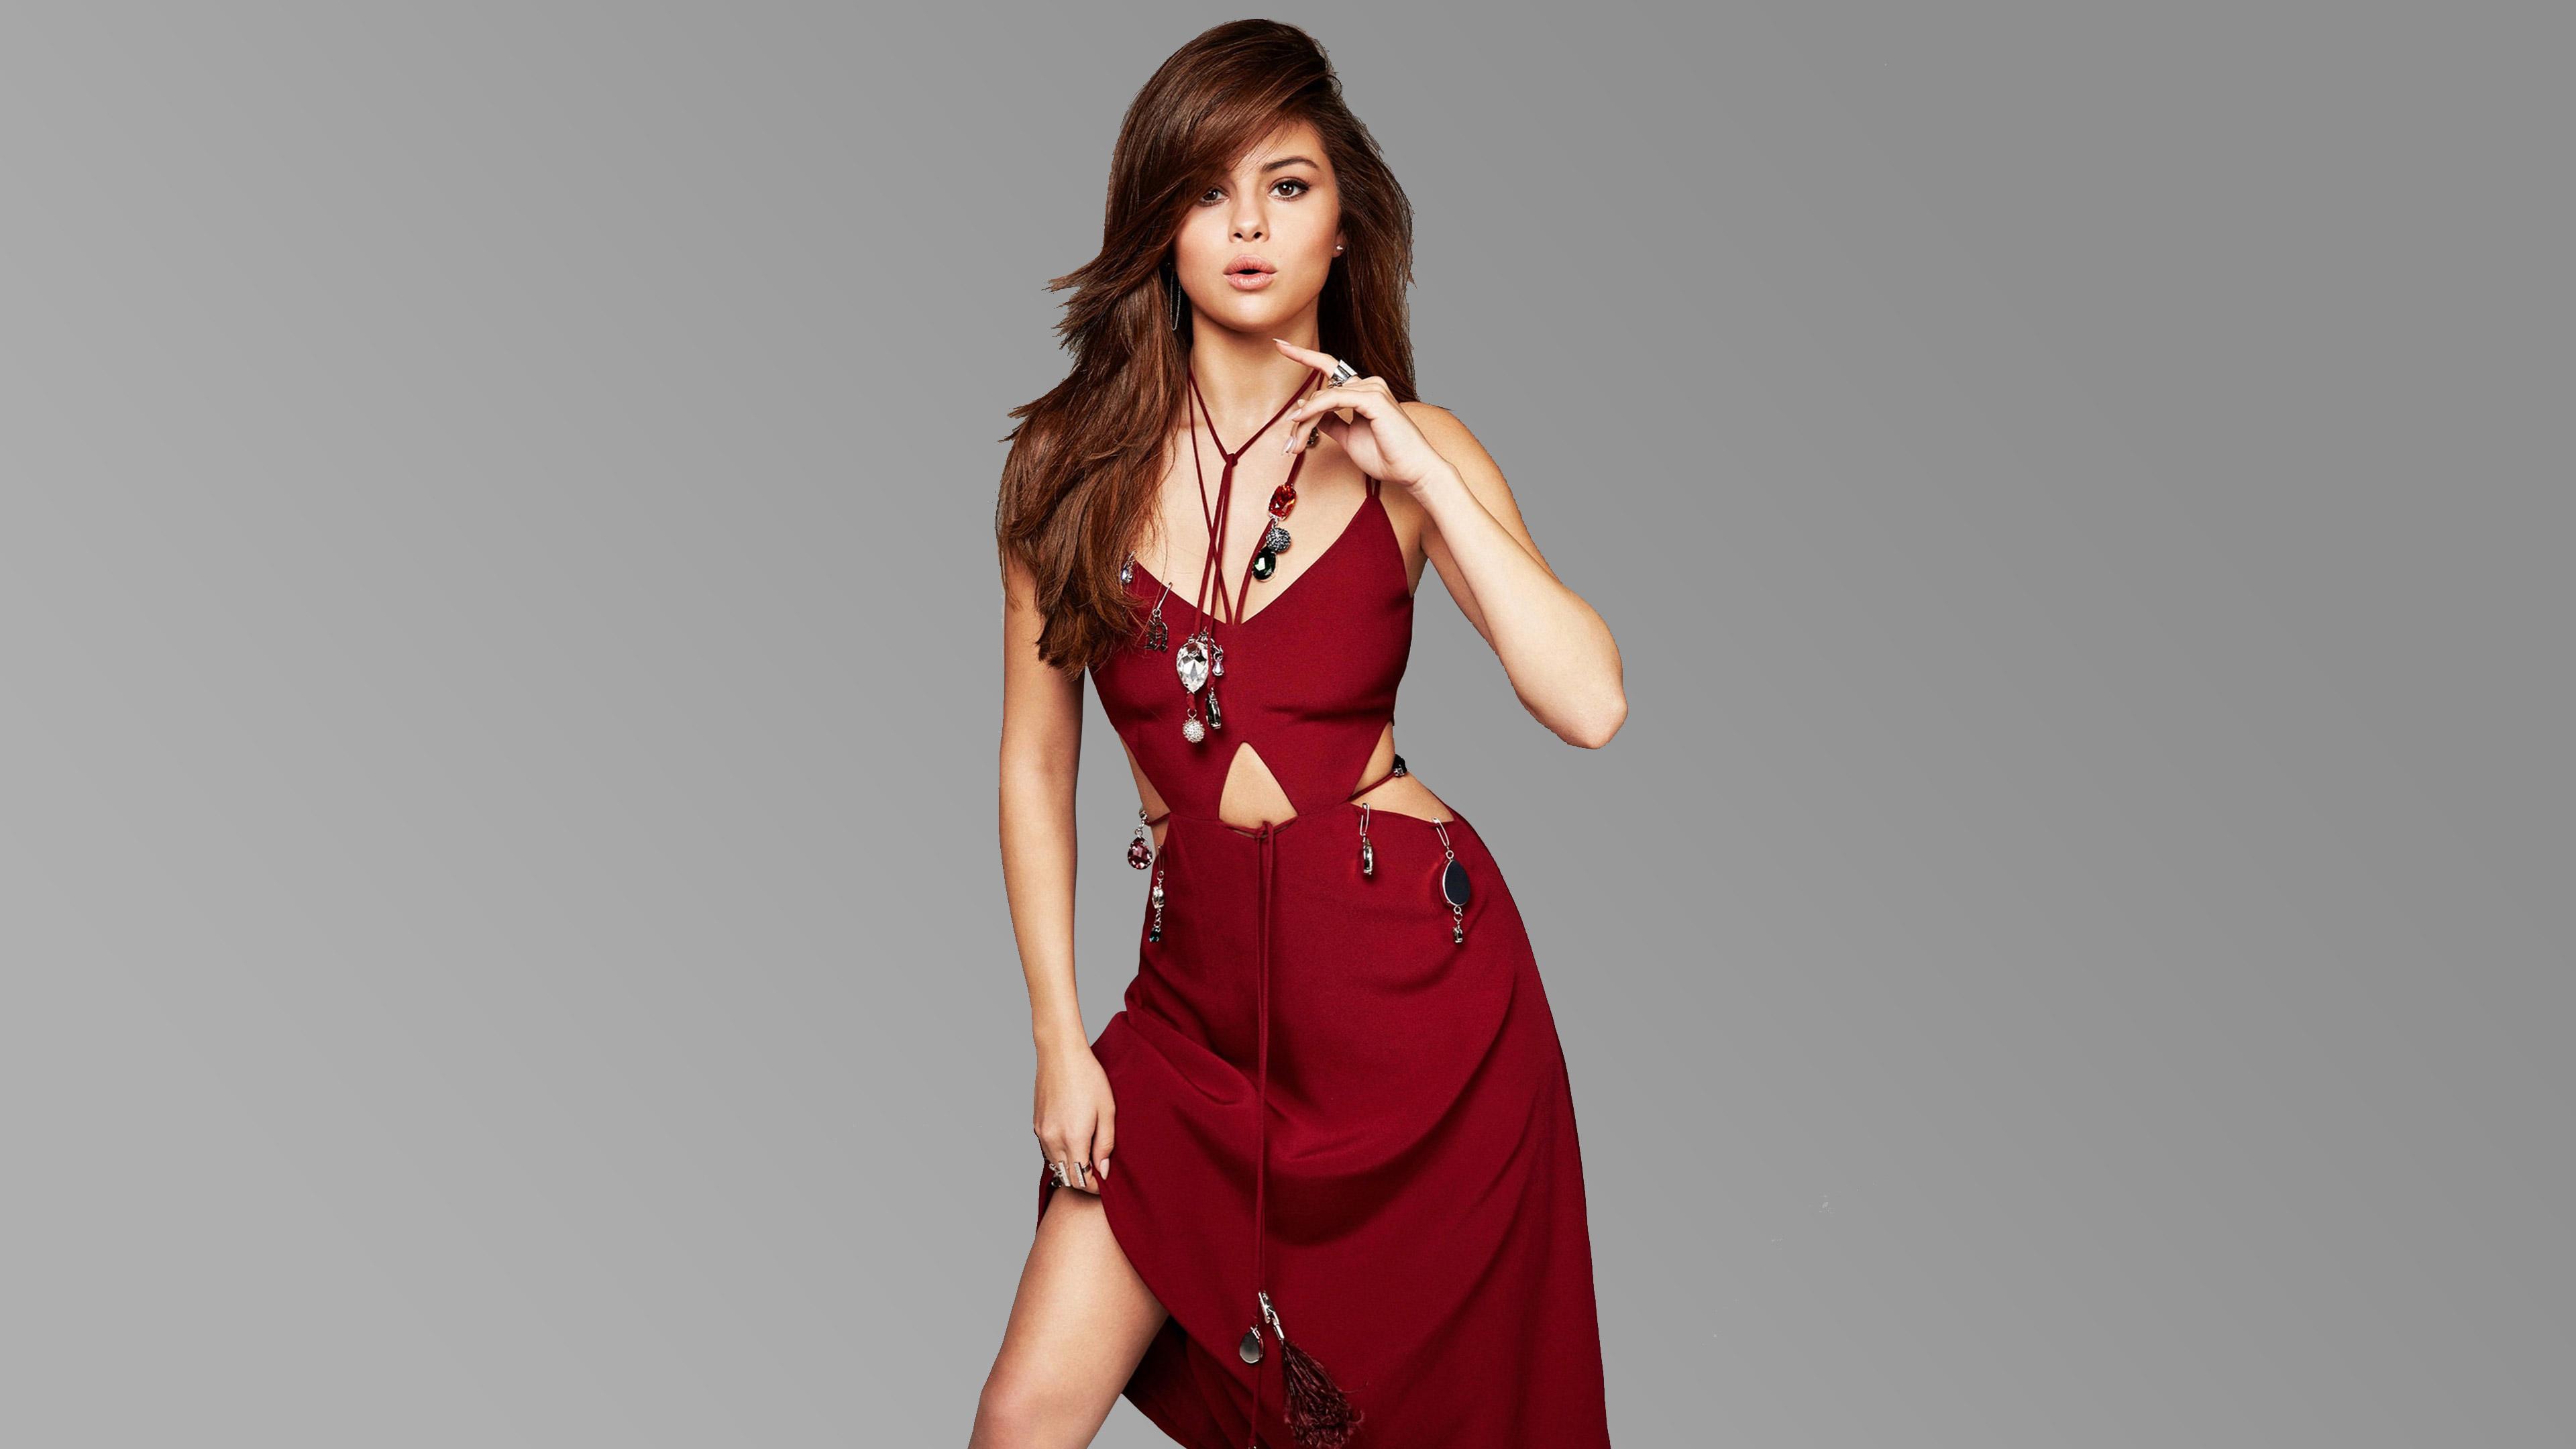 selena gomez 36 1536857078 - Selena Gomez 36 - selena gomez wallpapers, music wallpapers, girls wallpapers, celebrities wallpapers, 4k-wallpapers